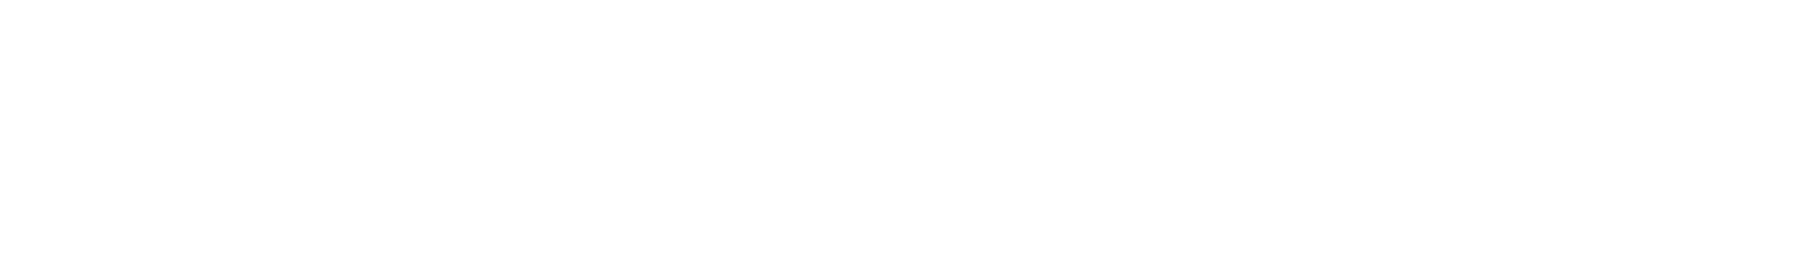 ehu liveperc125 014